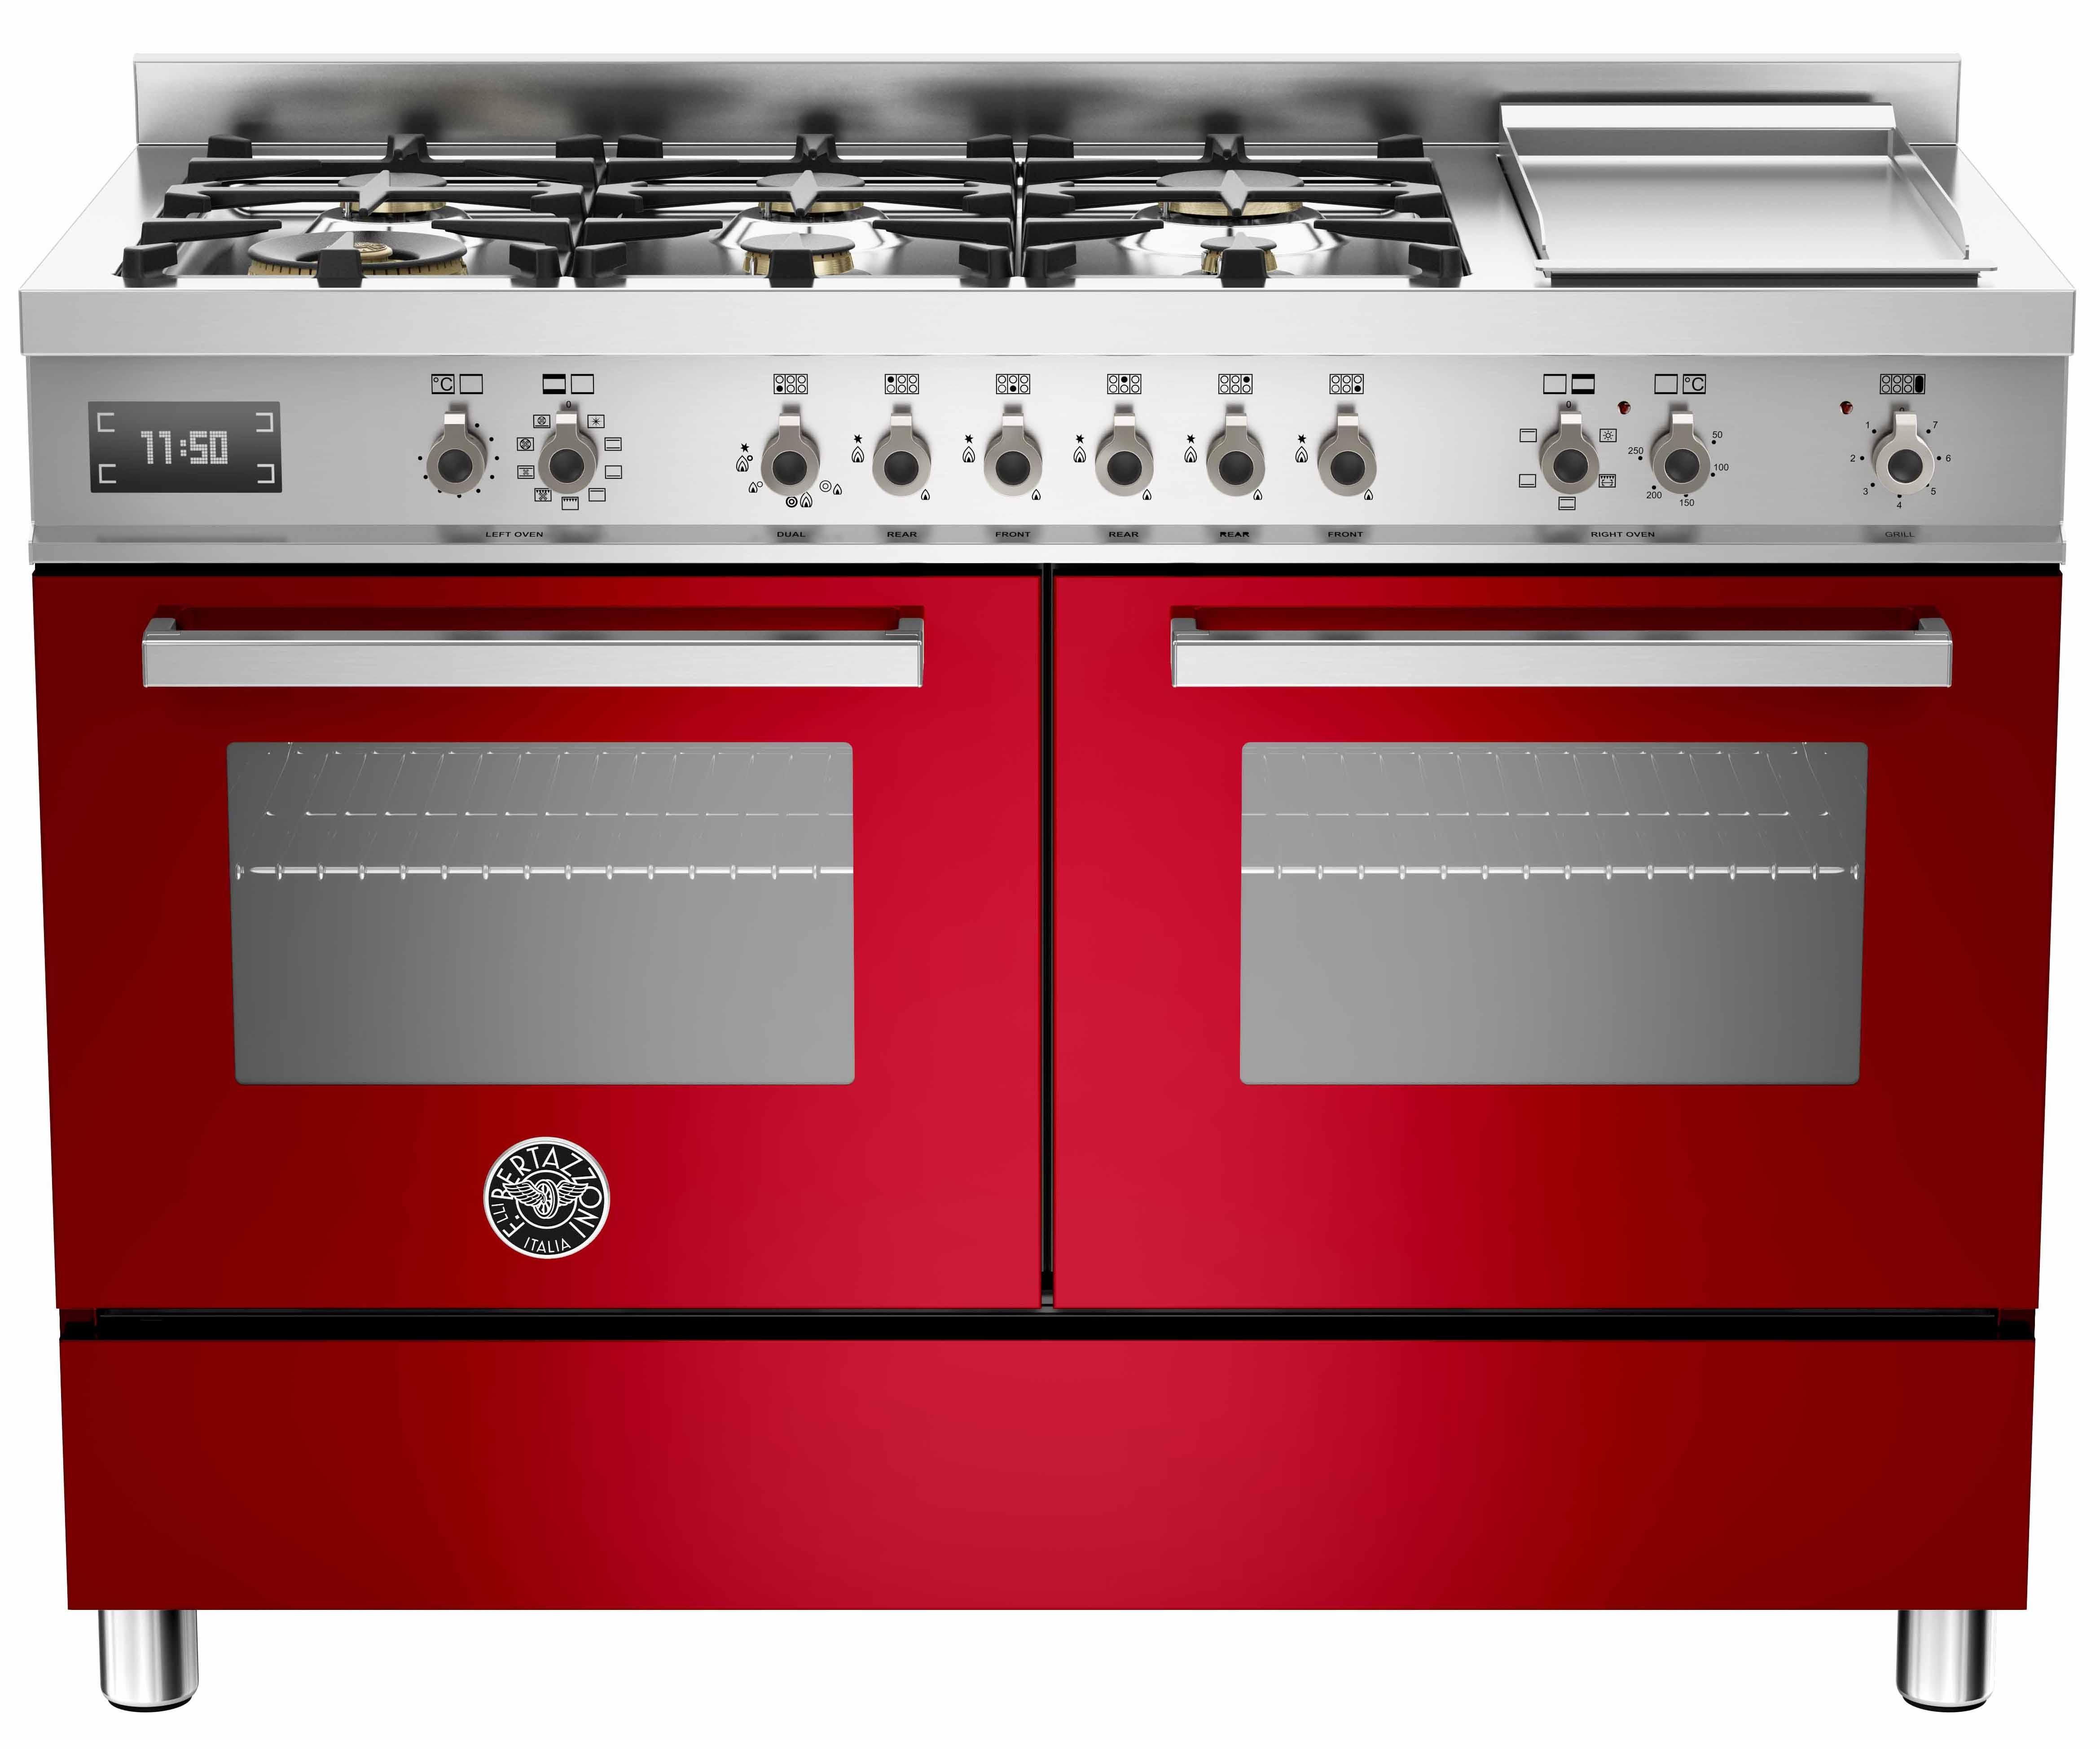 Bertazzoni PRO1206 Gasspis 120 cm, 2 ugnar, 6 brännare + elektrisk tepanyaki, röd